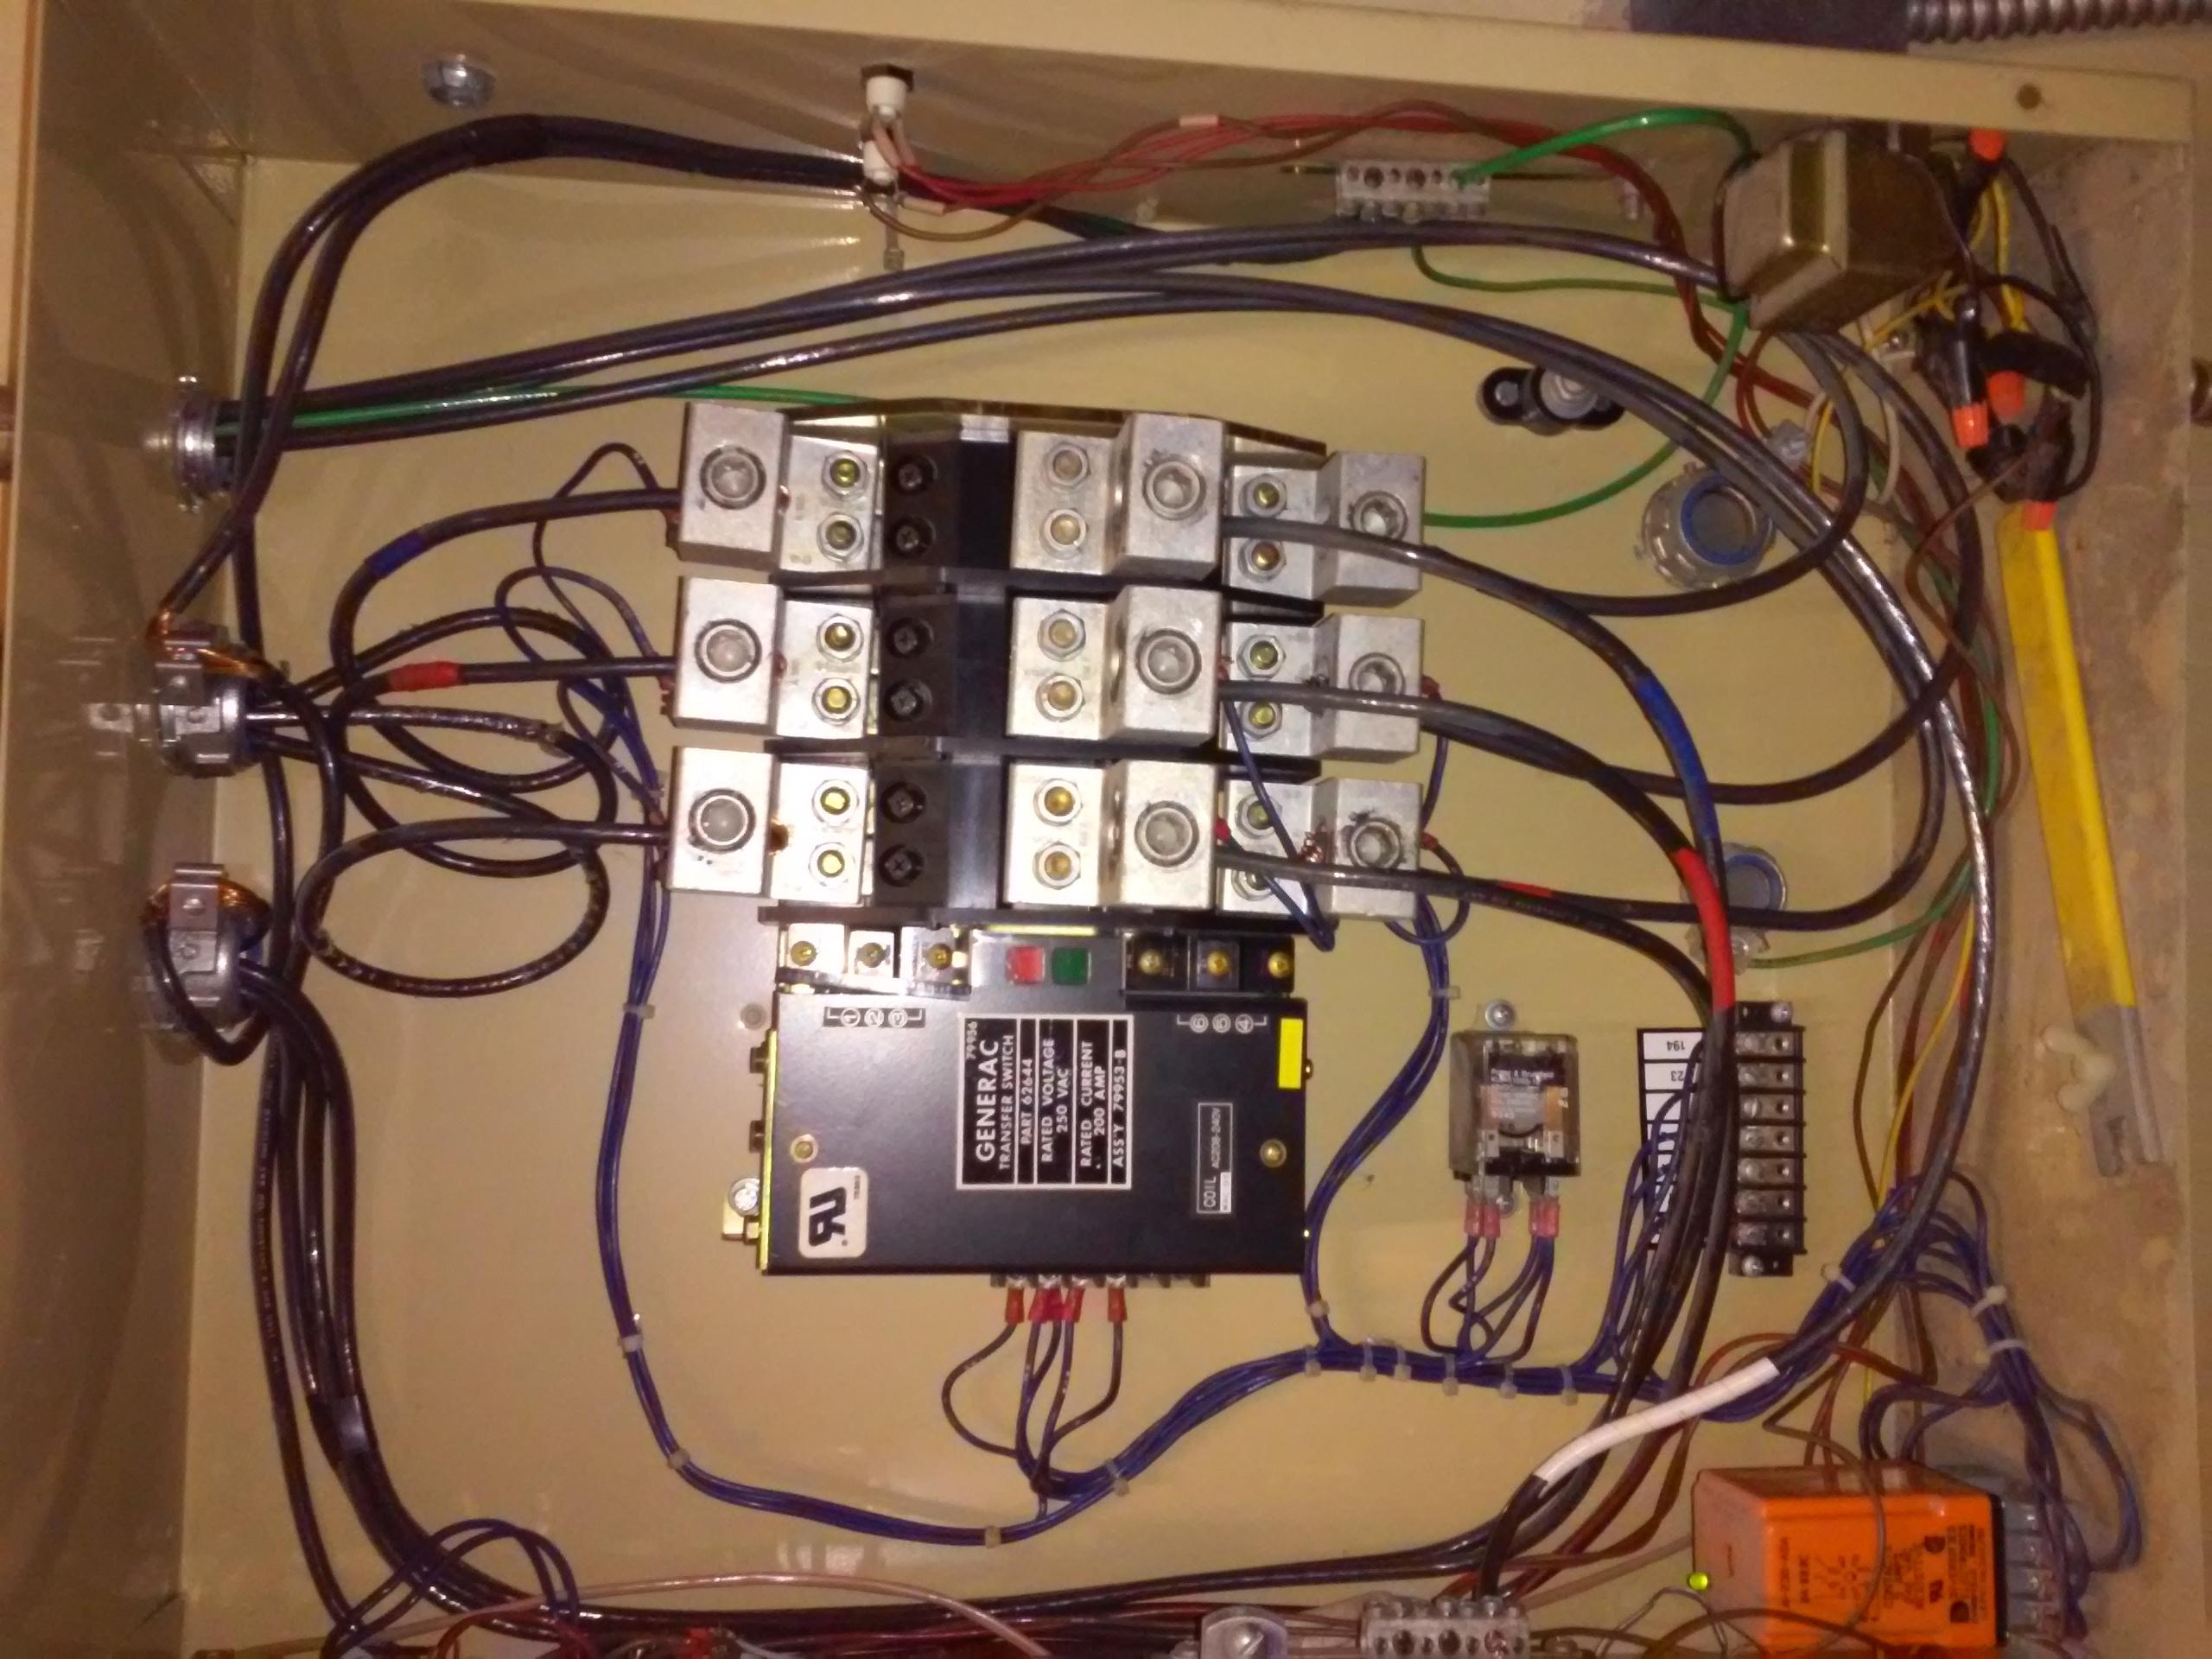 Generac Rts Transfer Switch Wiring - Wiring Diagram Detailed - Generac Manual Transfer Switch Wiring Diagram